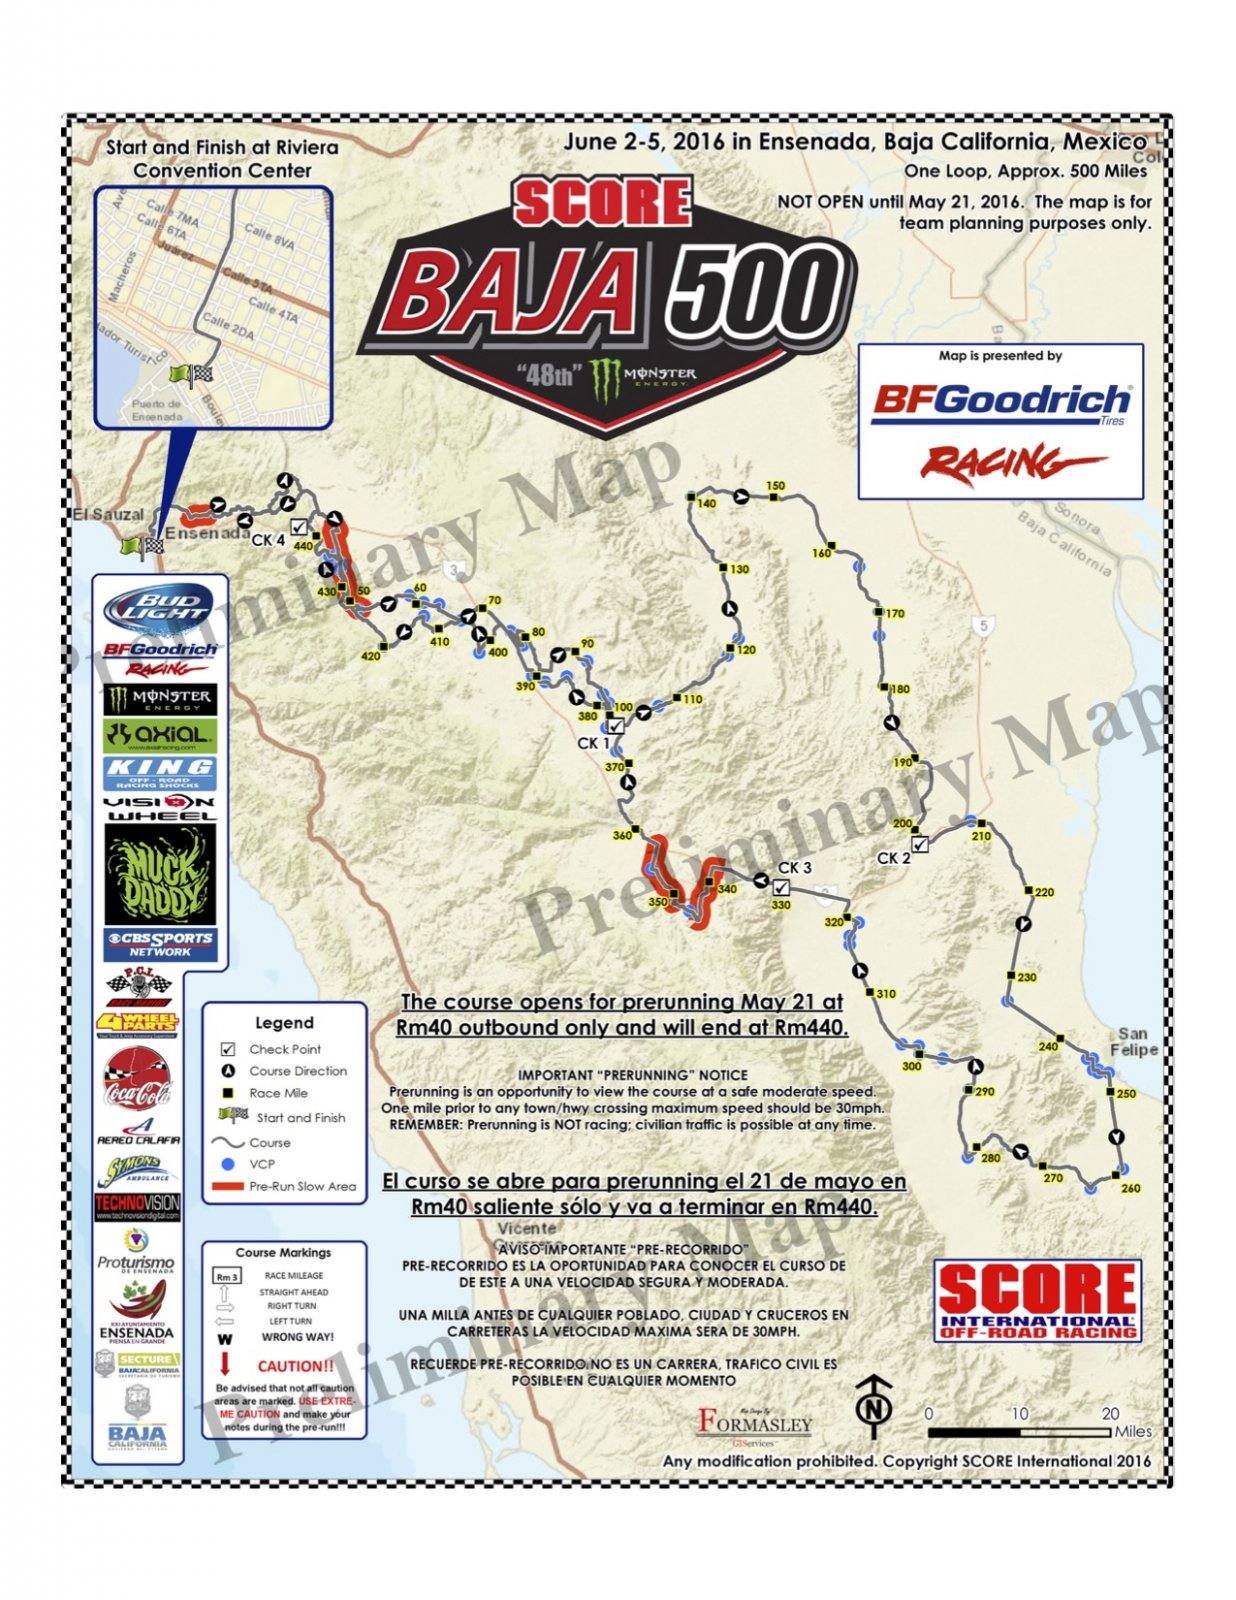 SCORE-BAJA-500-COURSE-Mapv6.jpg